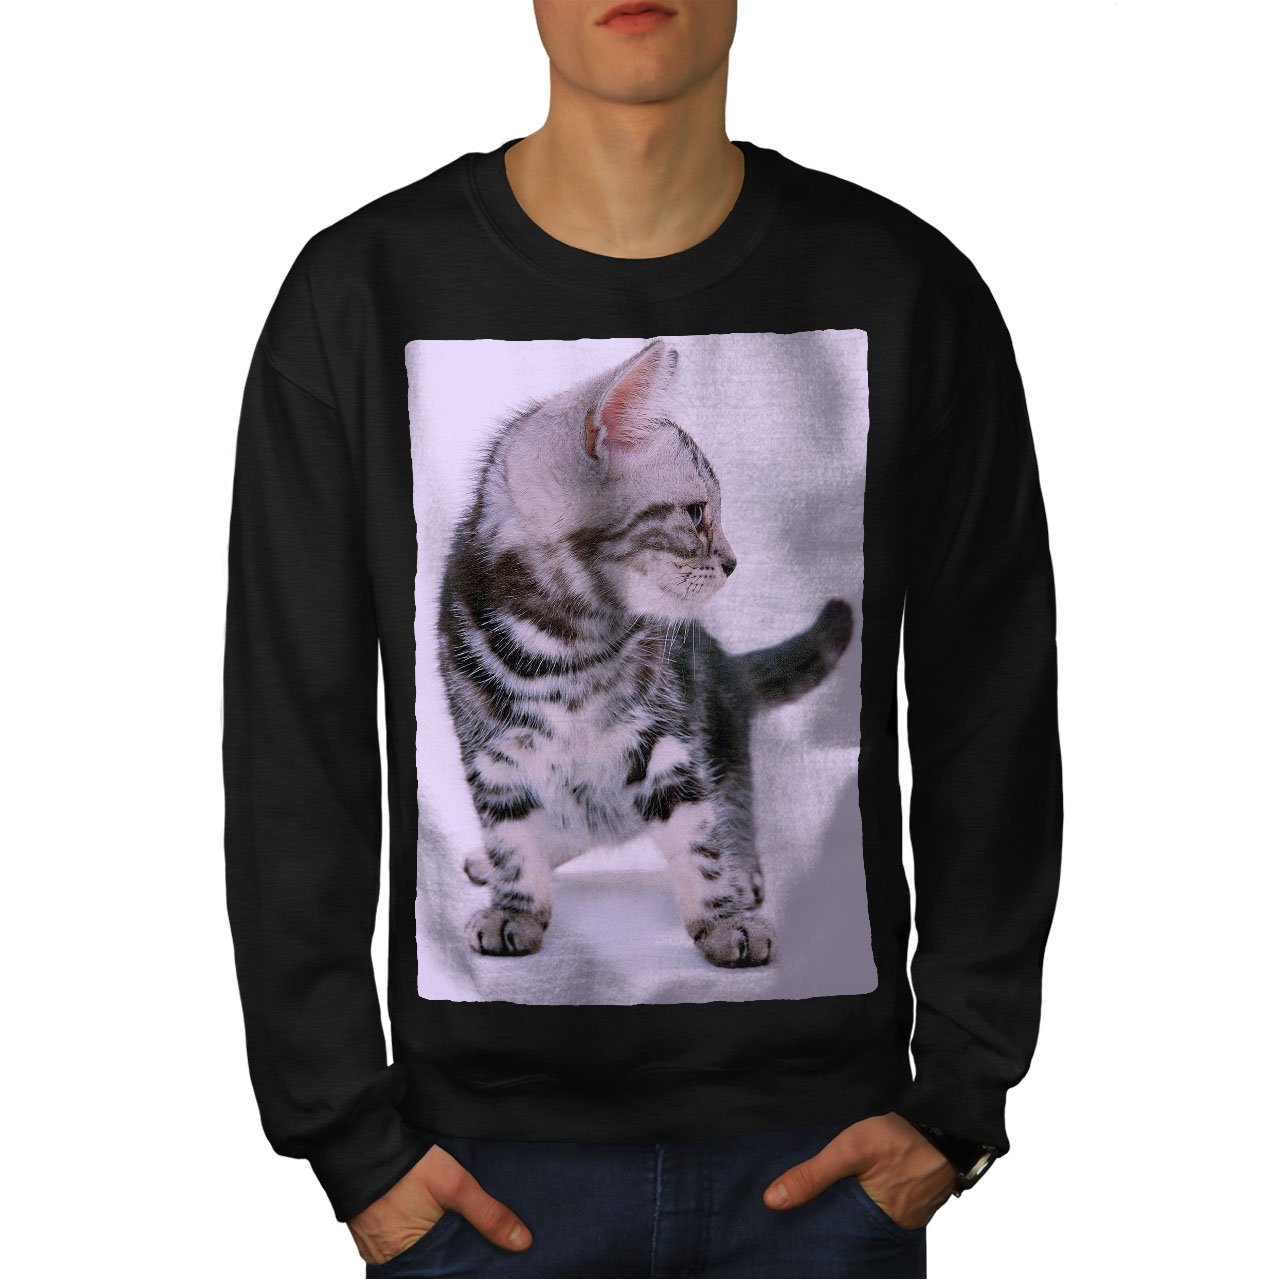 Cat Casual Jumper wellcoda Cat Photo Kitty Animal Mens Sweatshirt